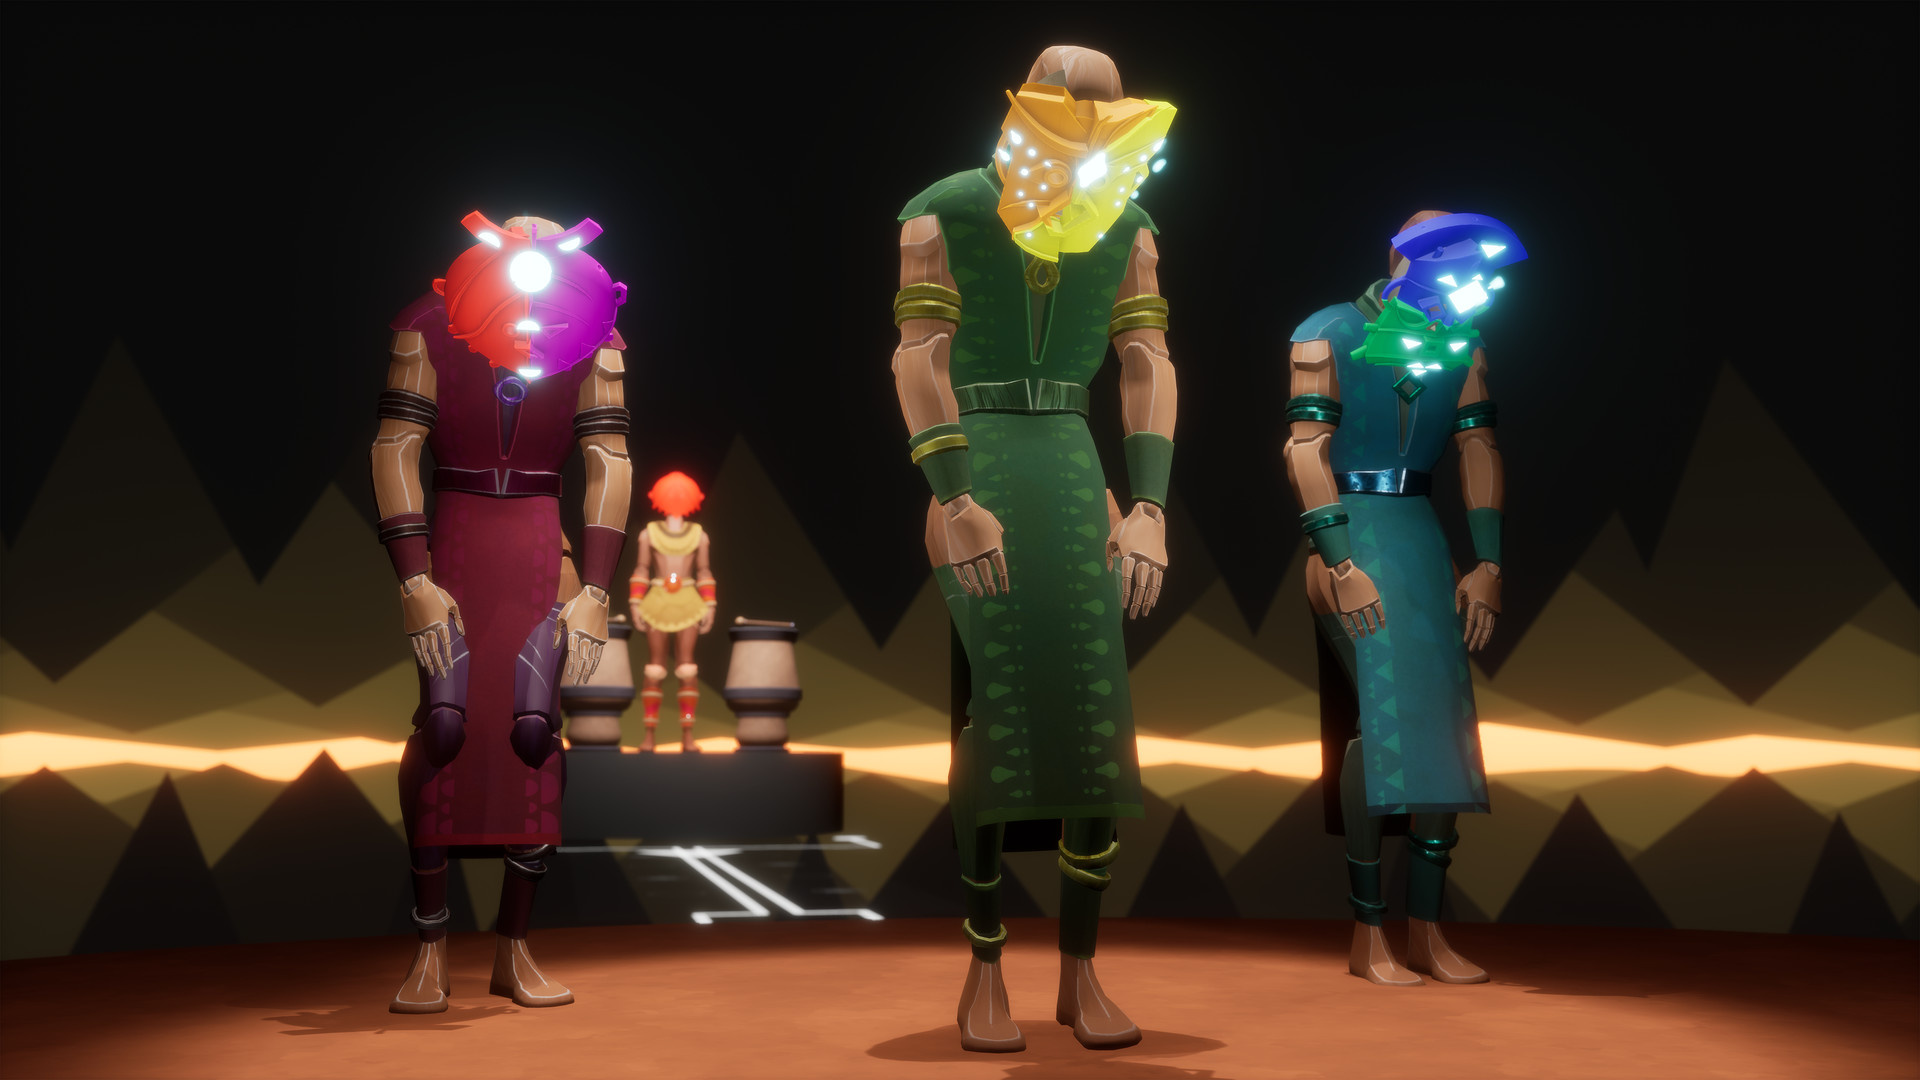 Innerspace анонсировала VR-головоломку Maskmaker